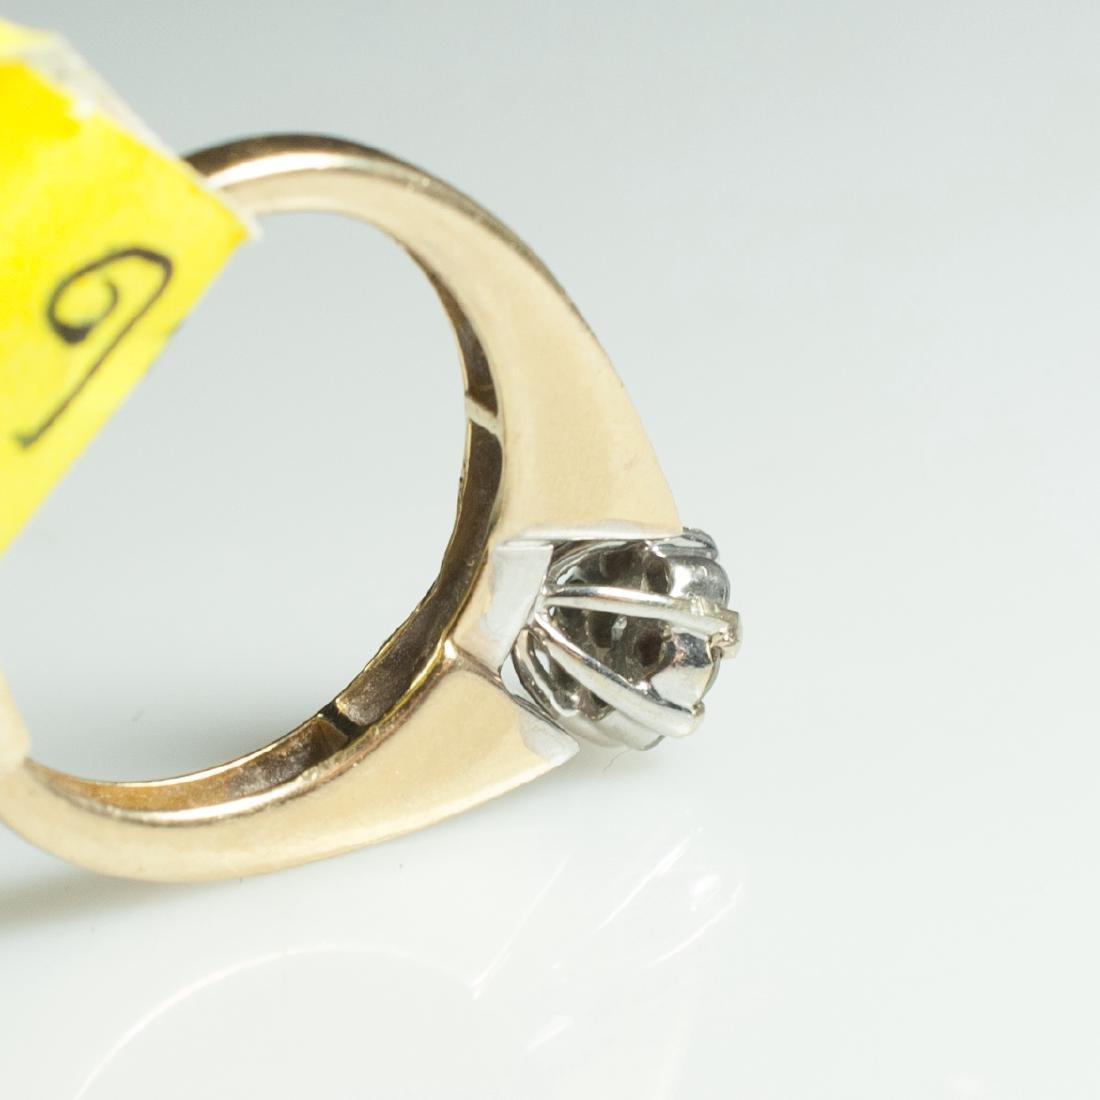 14kt Gold & Diamond Engagement Ring - 4